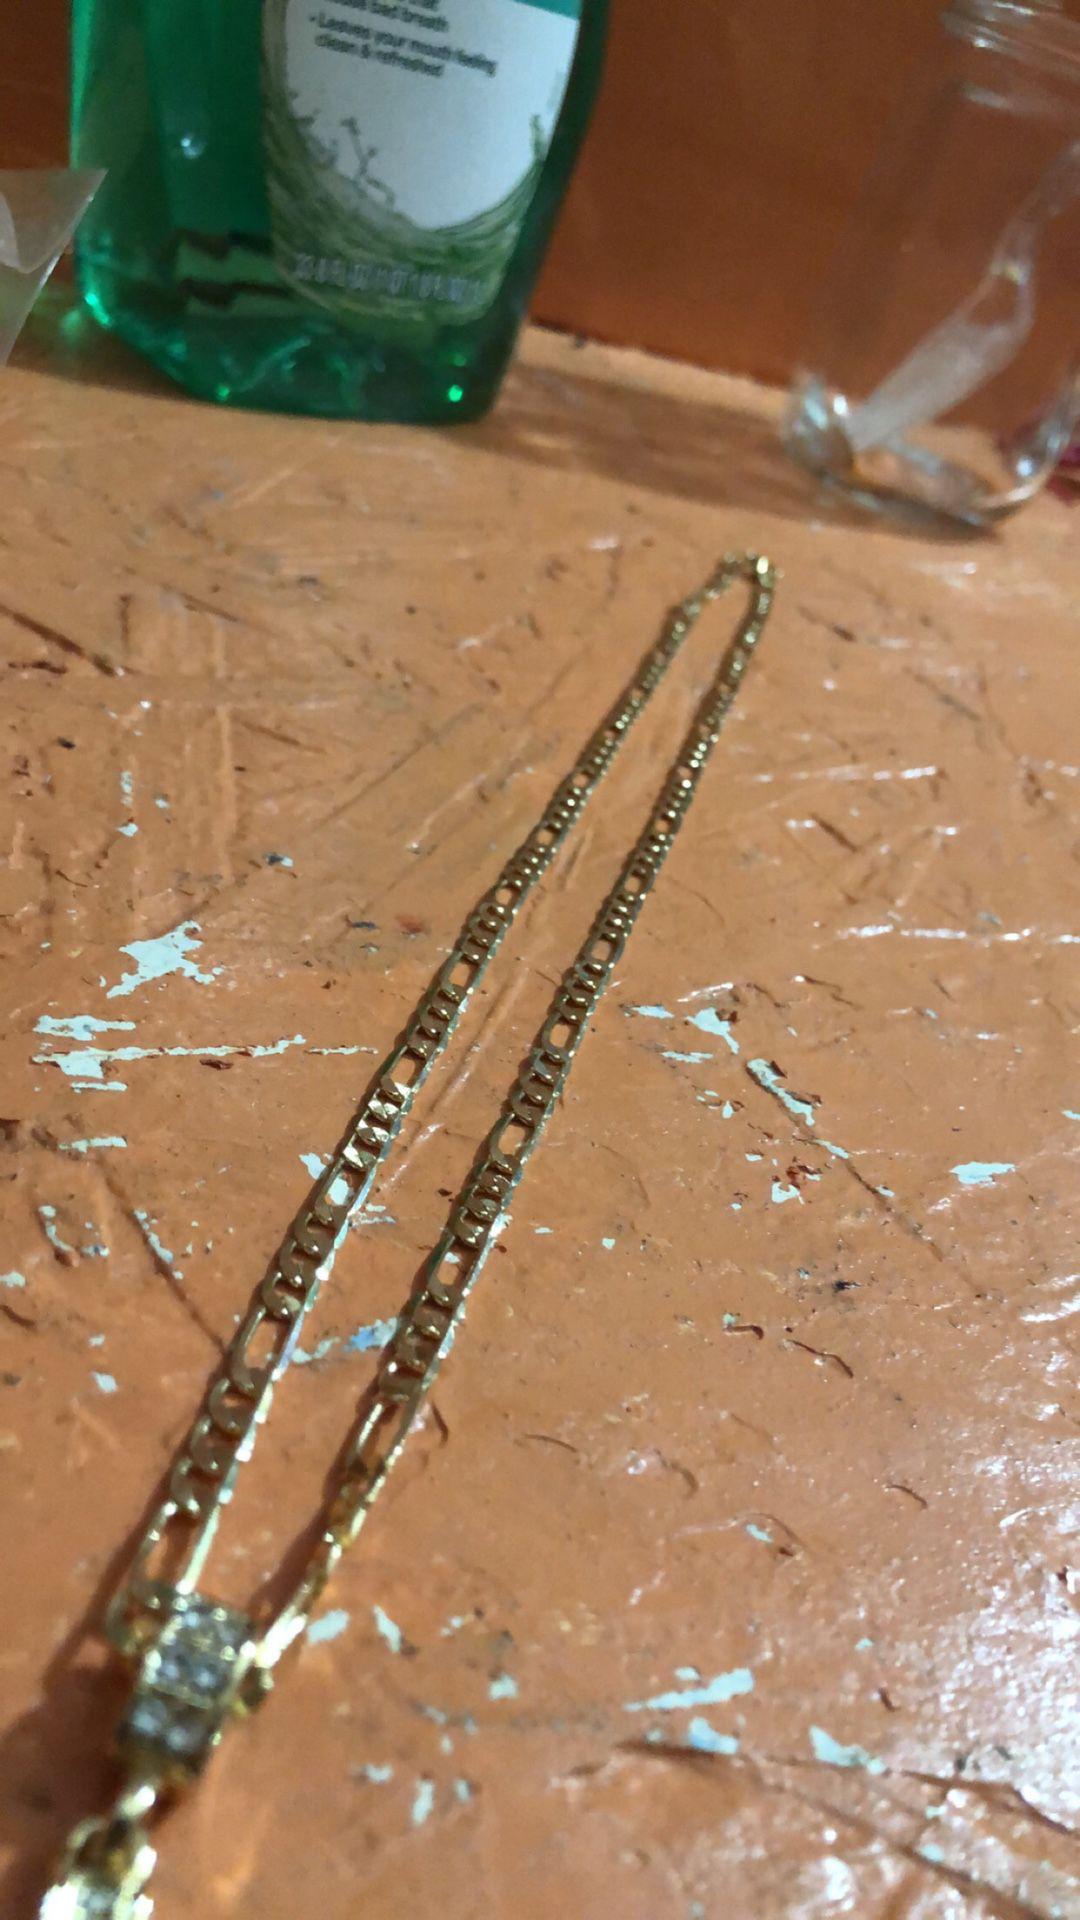 10k Gold Fígaro Chain Wit Cross Pendant